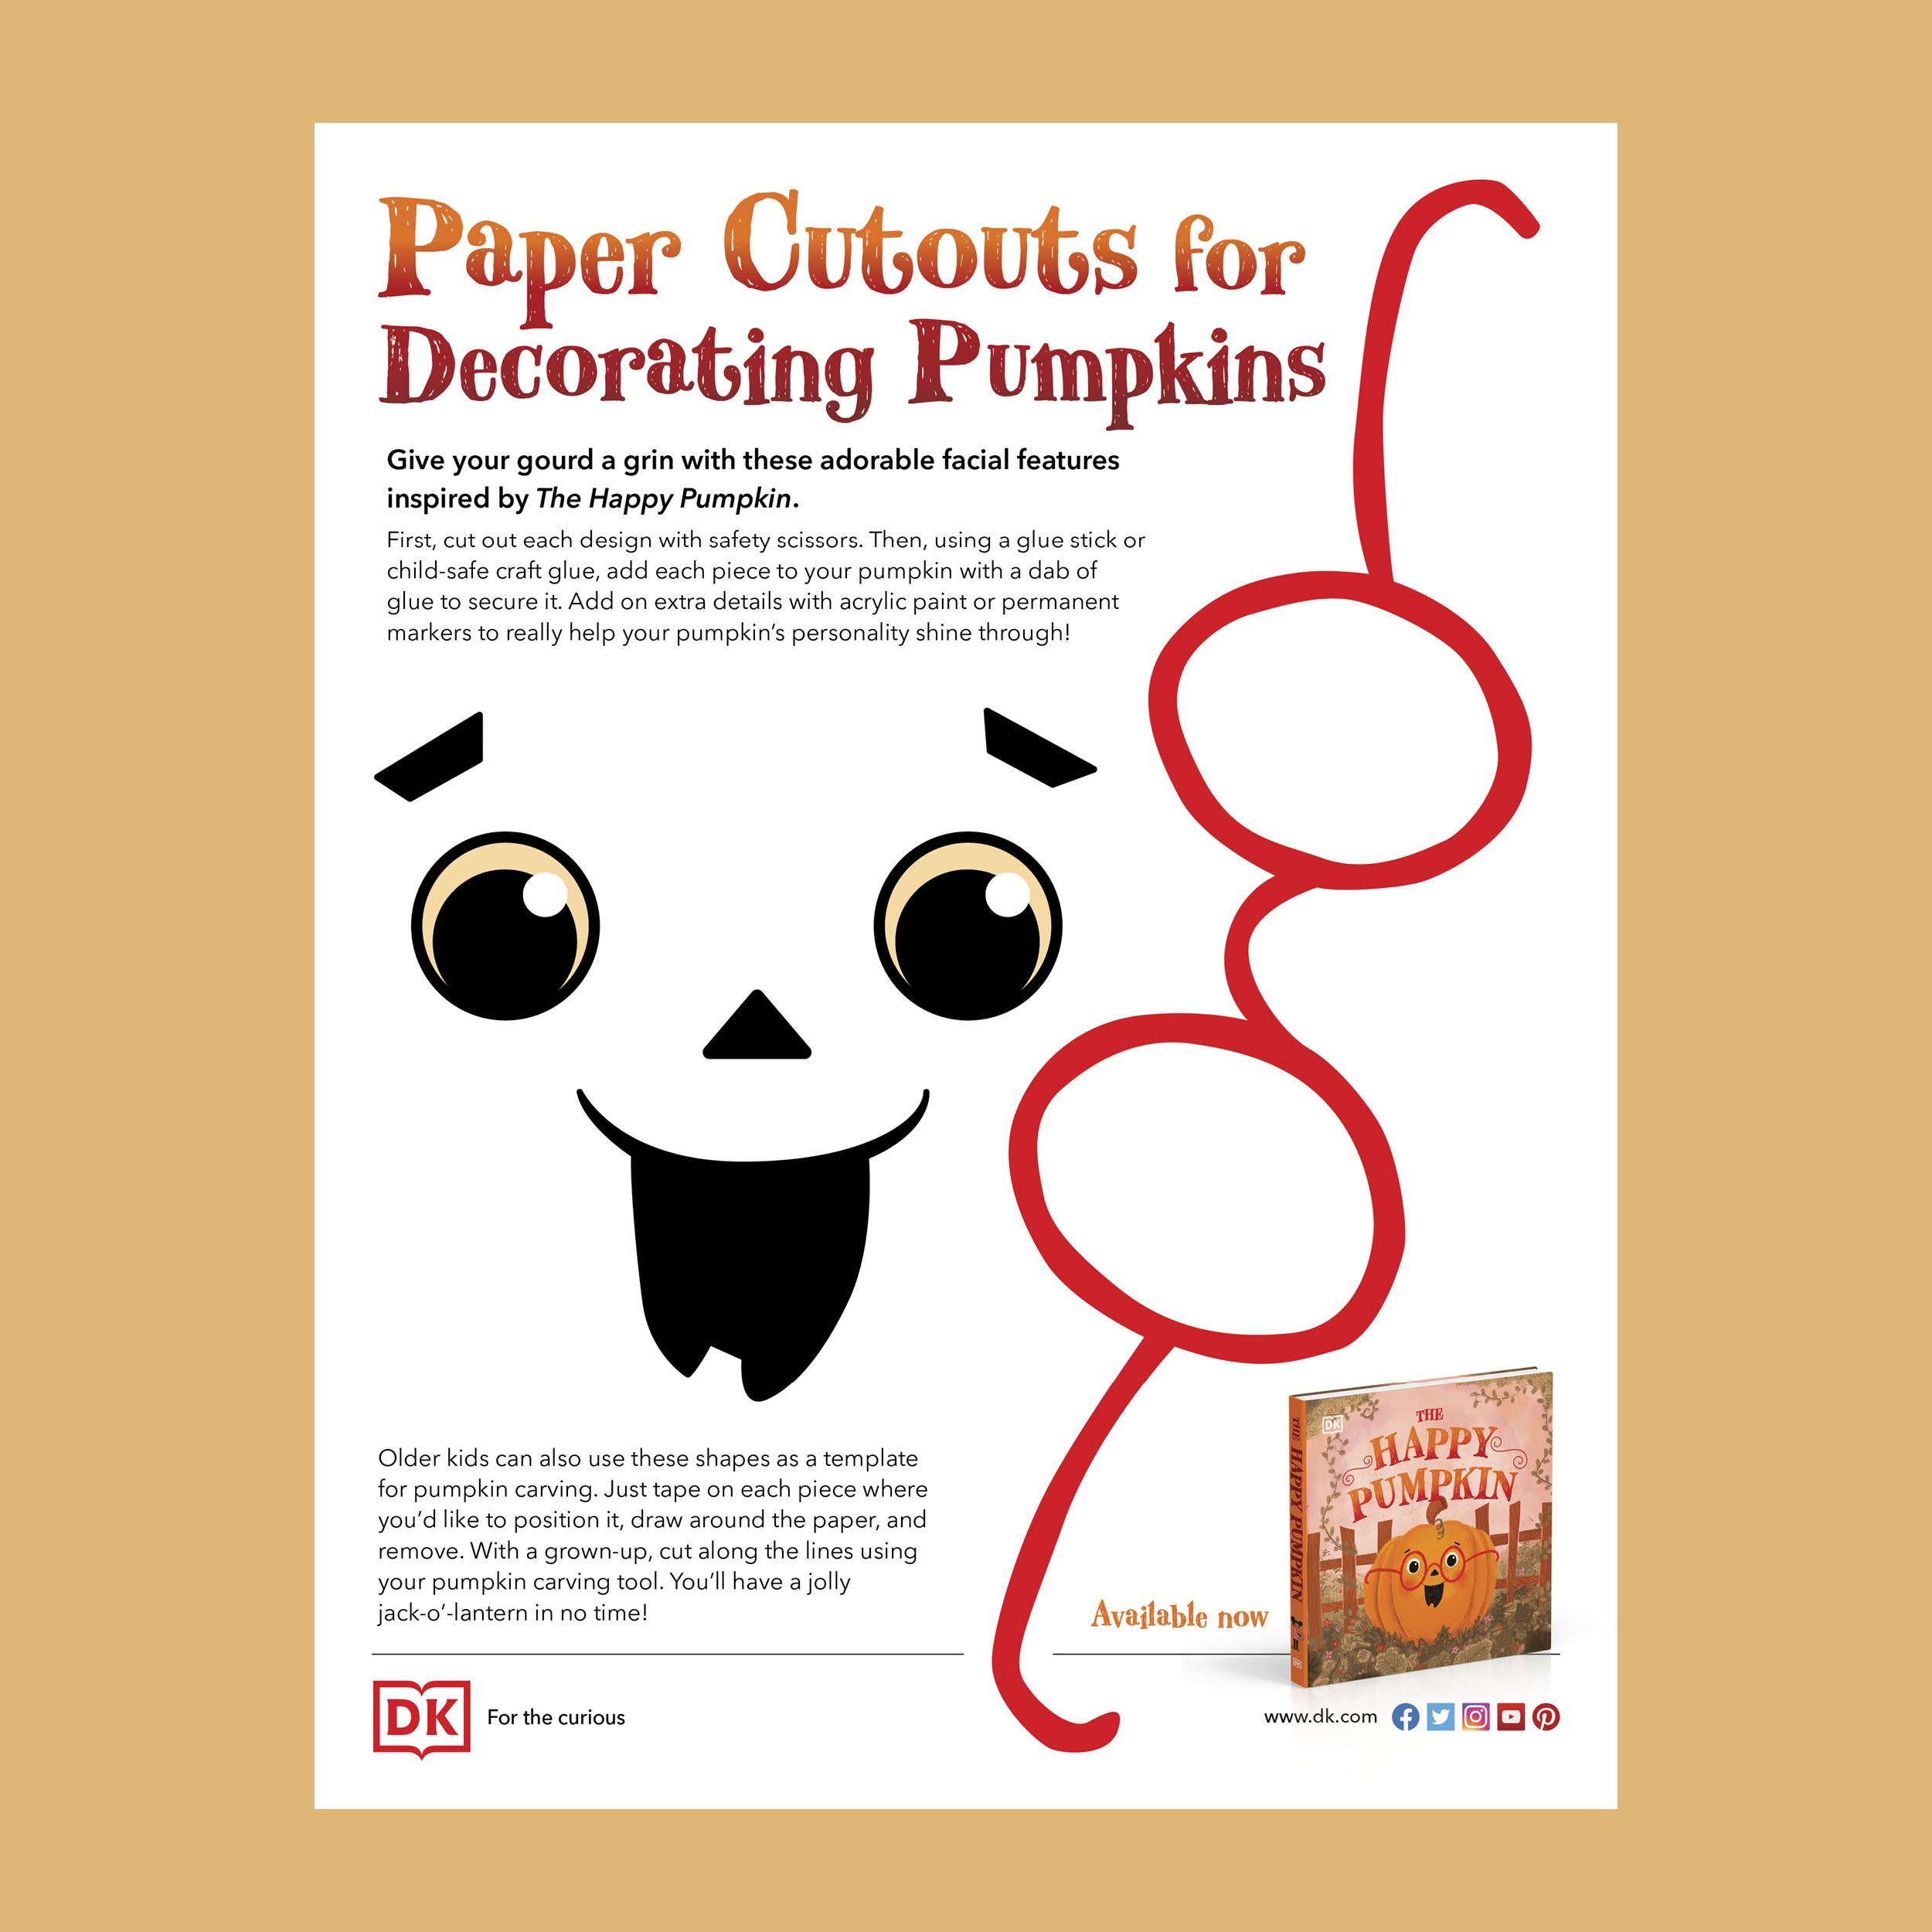 Paper Cutouts for Decorating Pumpkins Activity Sheet